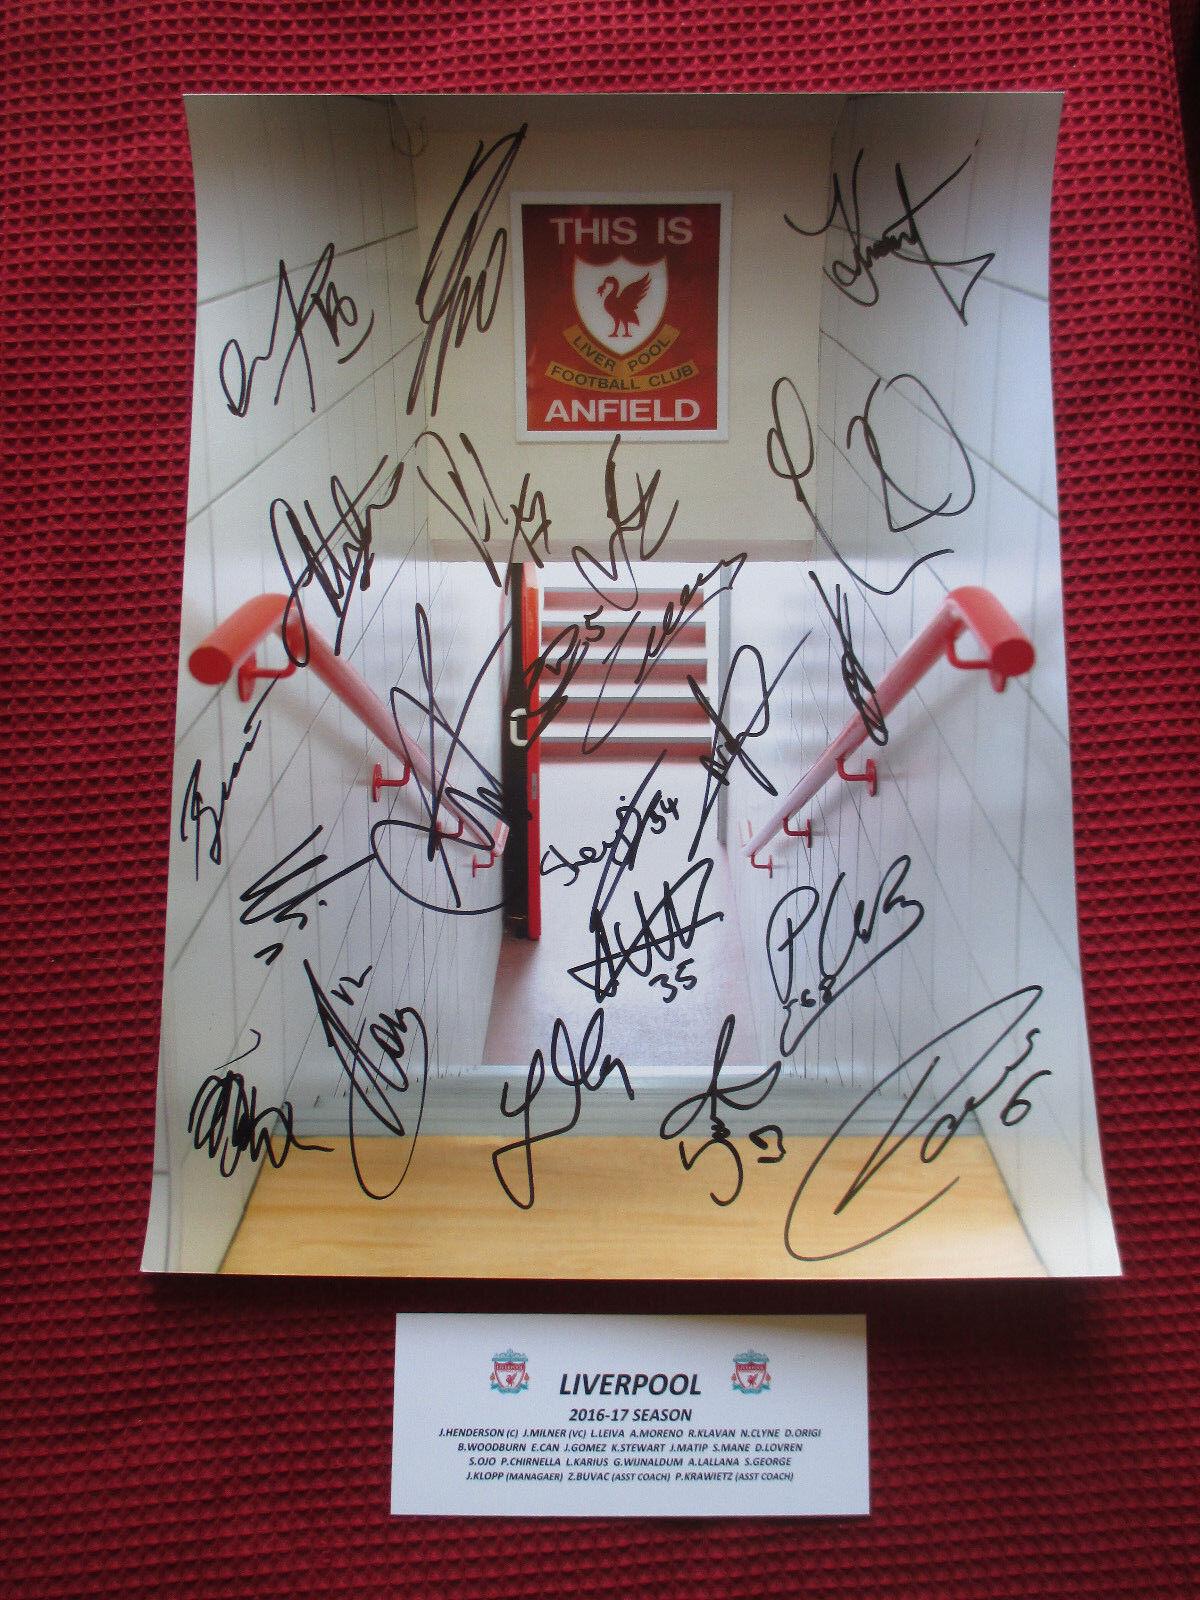 Liverpool Temporada 2016-17  23  mano firmado exhibición de fotos de 12  X 16  - a prueba de exacta